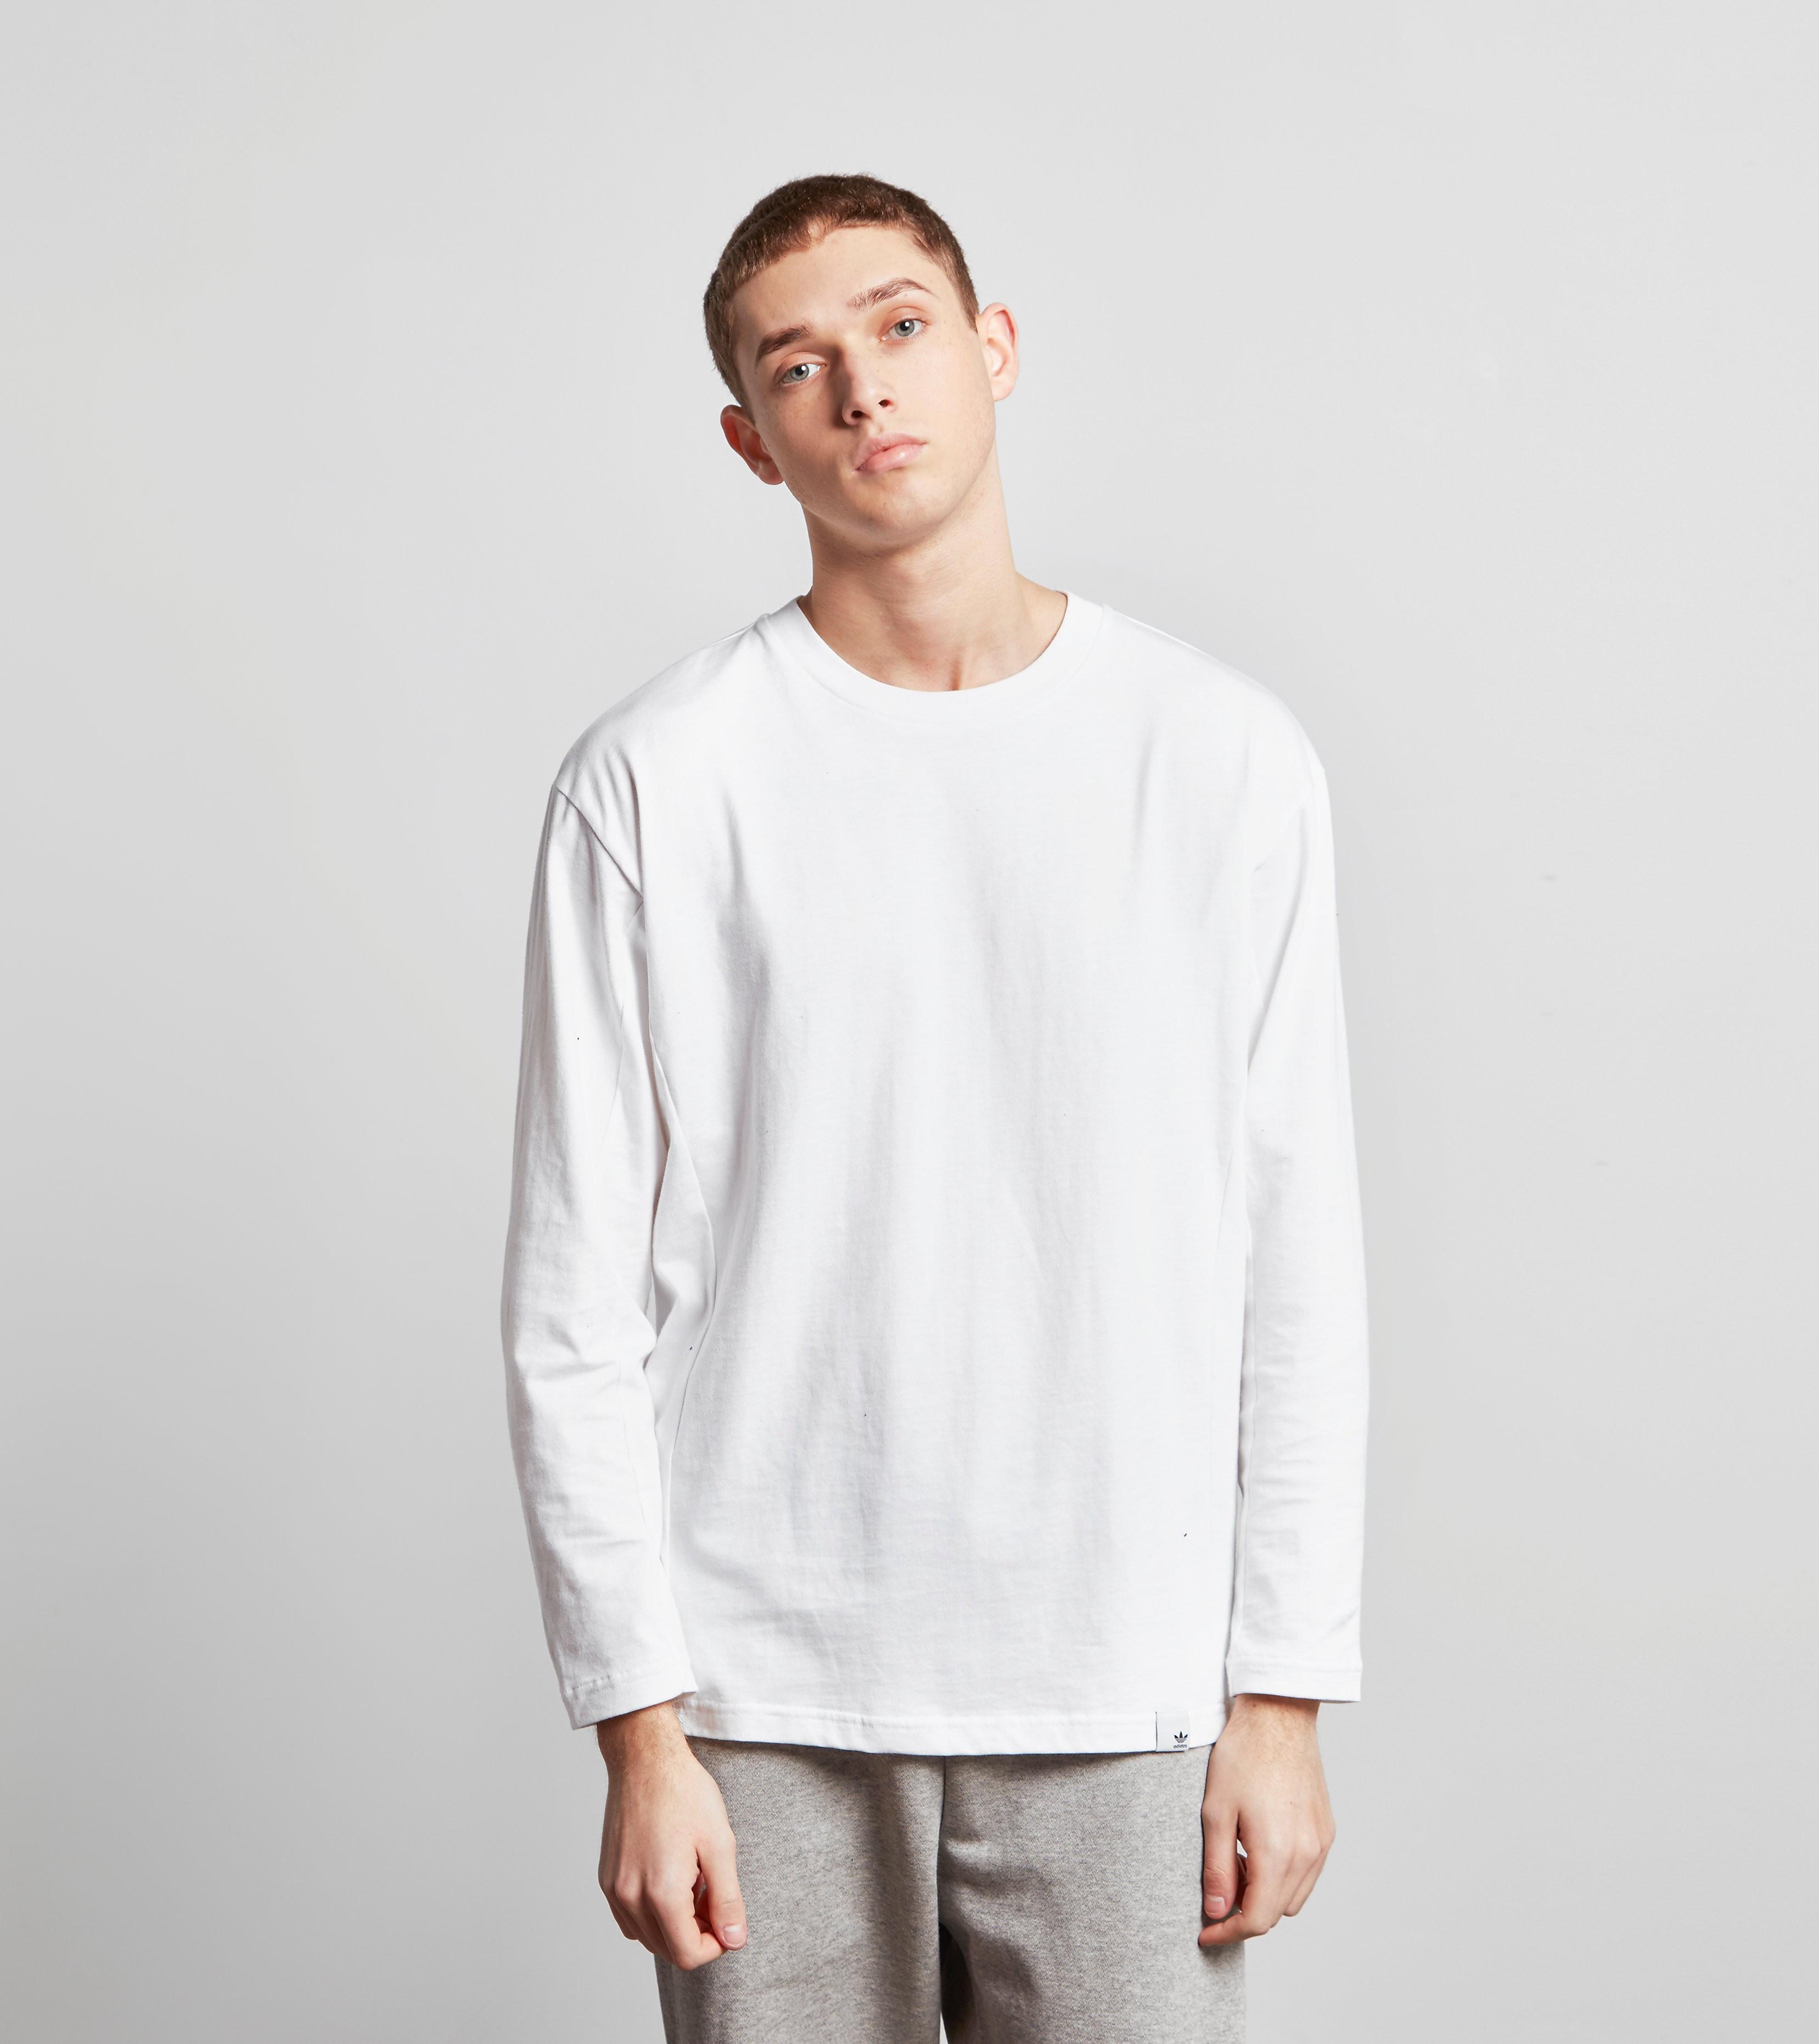 adidas Originals XBYO Long-Sleeve T-Shirt